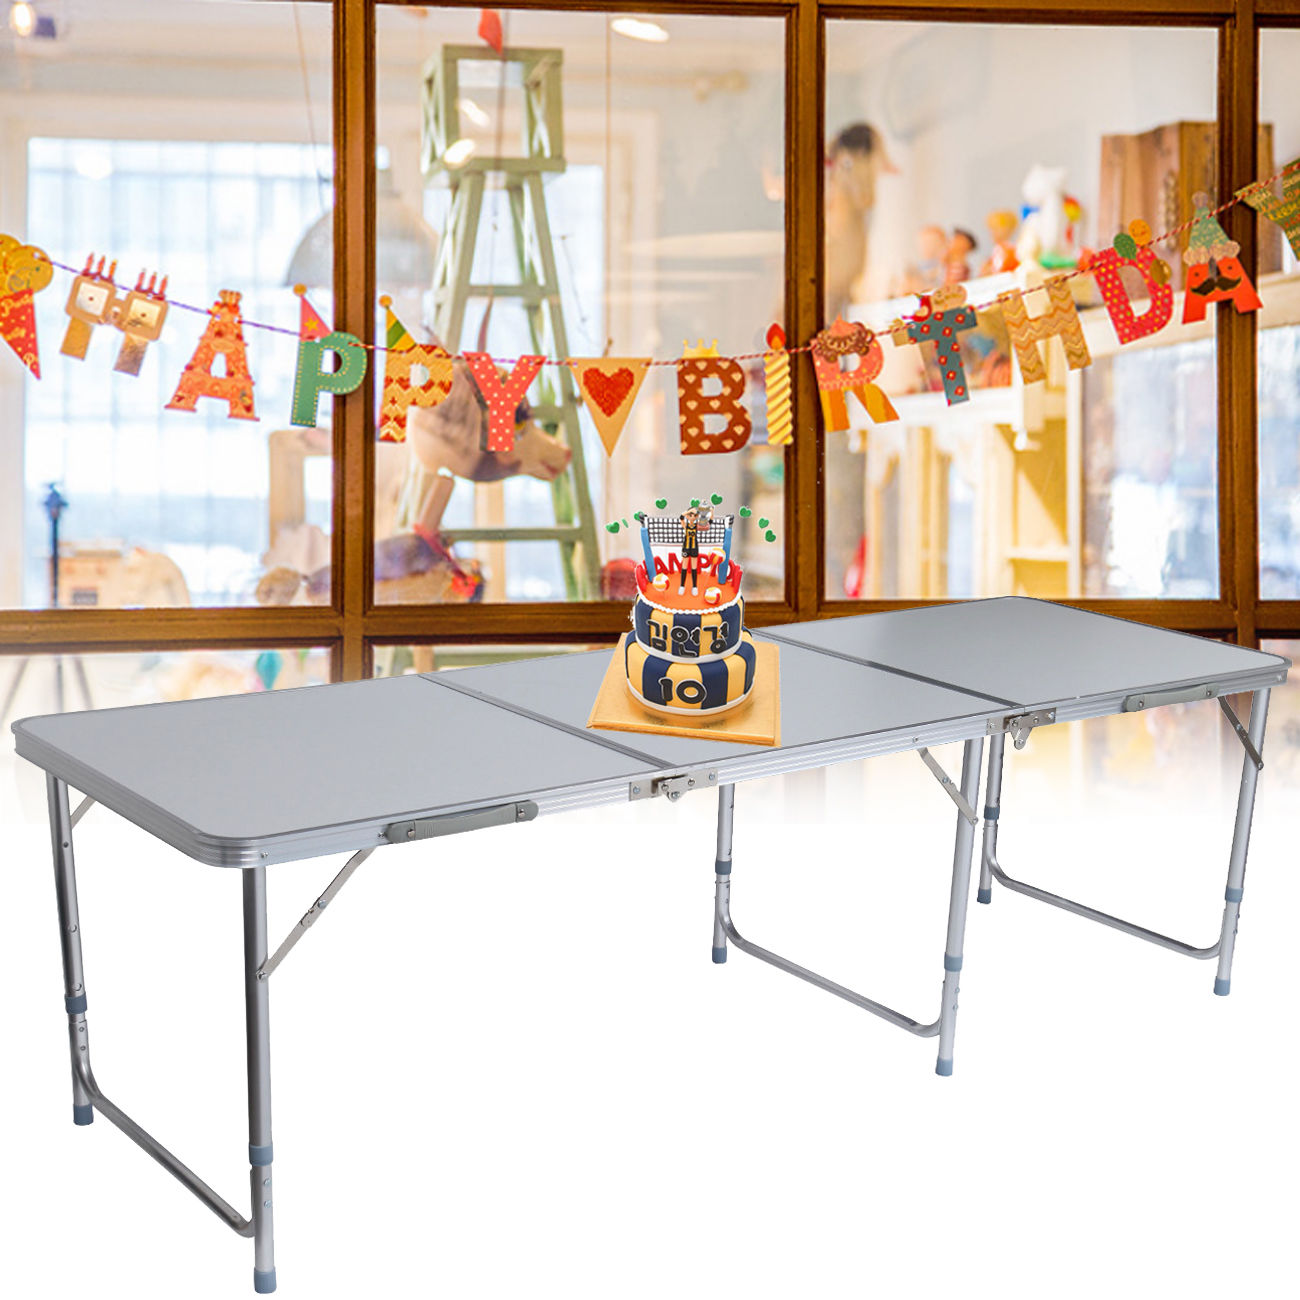 Table de camping de jardin pliable pliante en aluminium ...